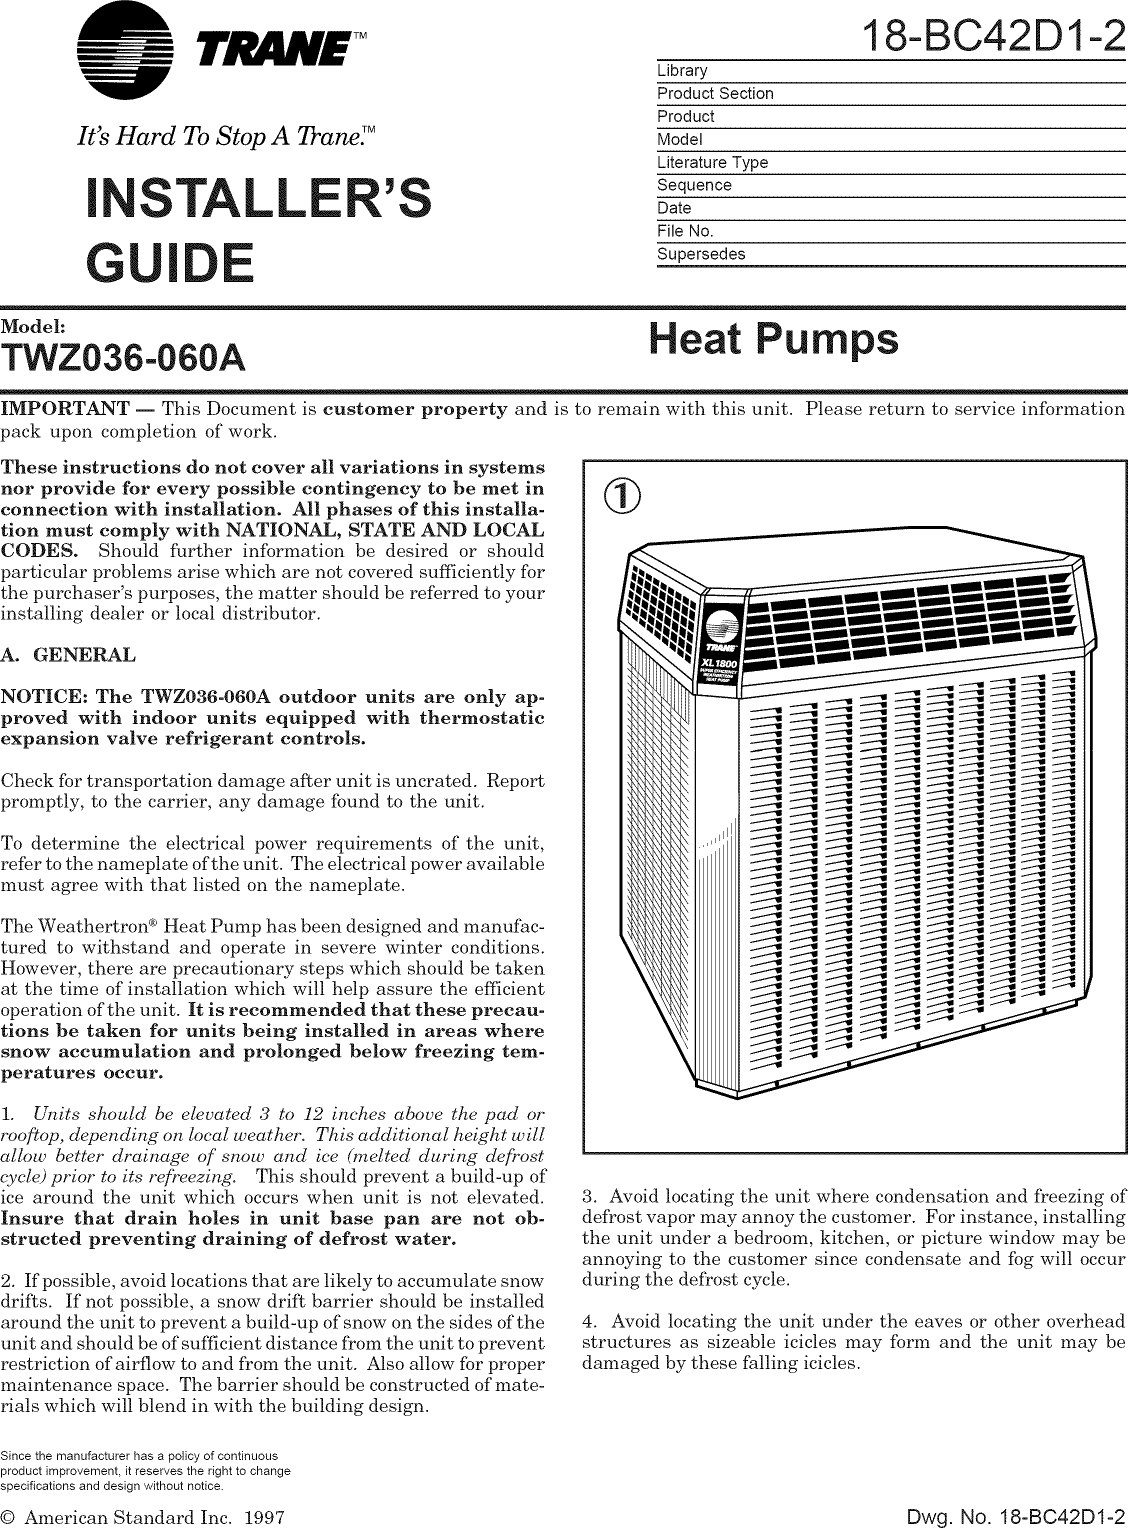 Trane Air Conditioner Heat Pump Outside Unit Manual L0810502